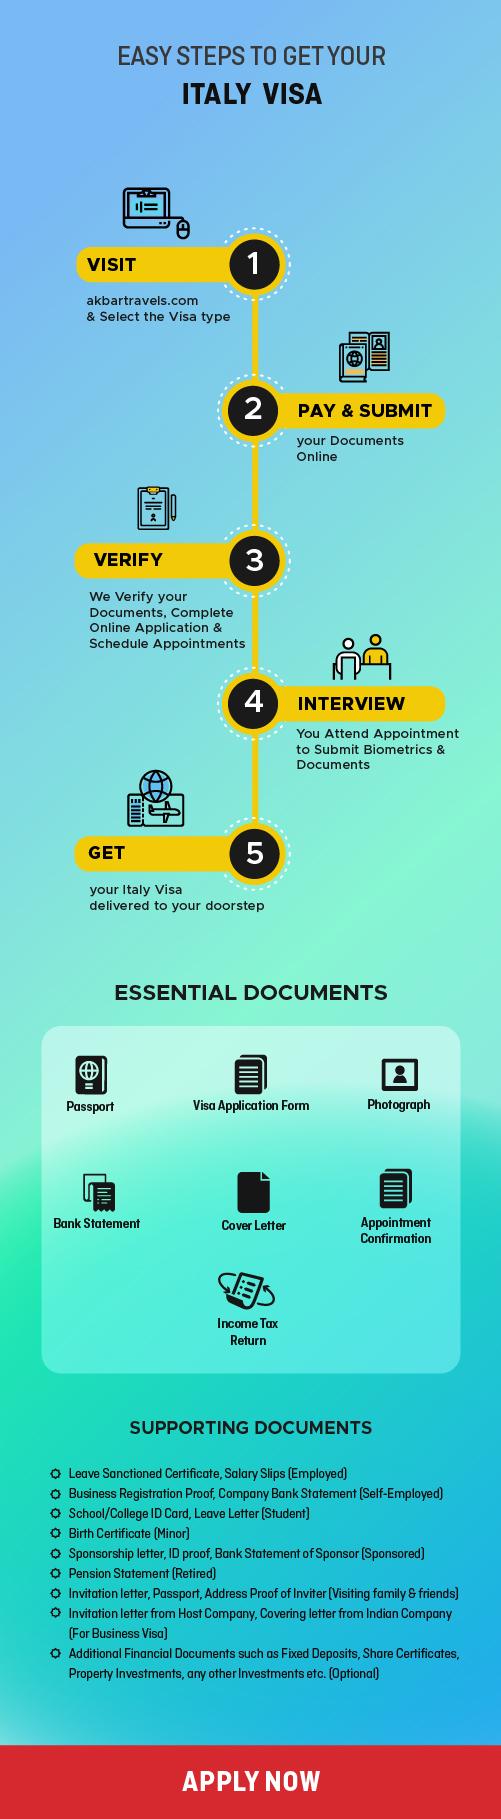 Apply for Italy visa online